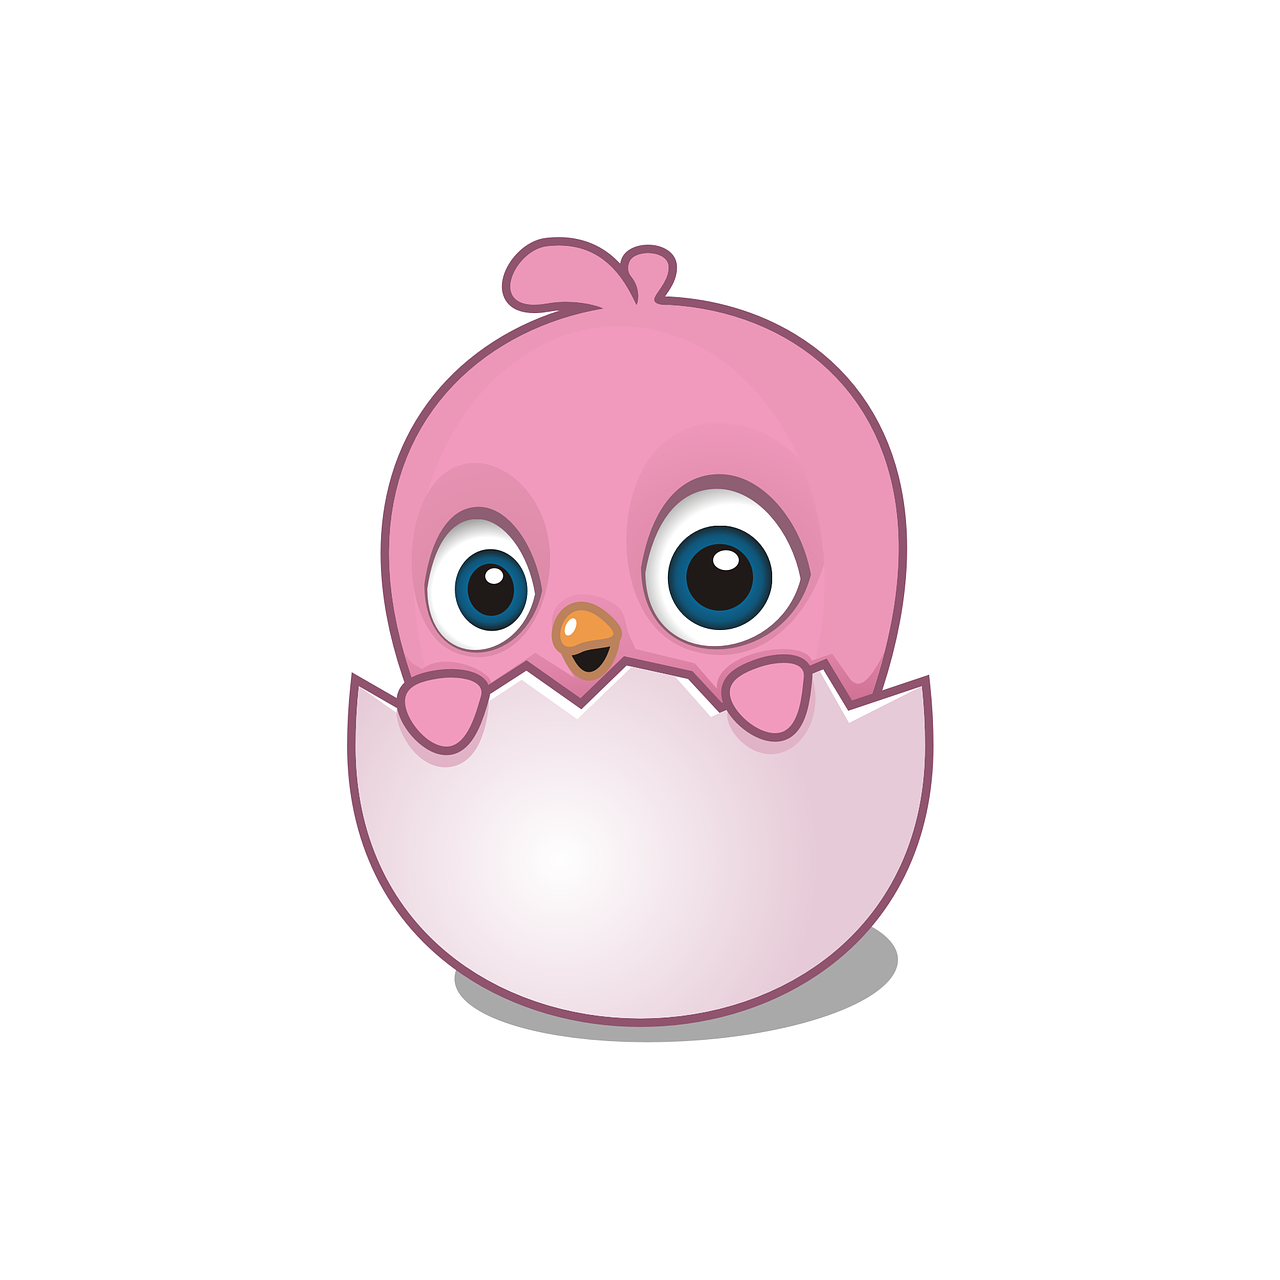 Egg Little Chick Free Image On Pixabay